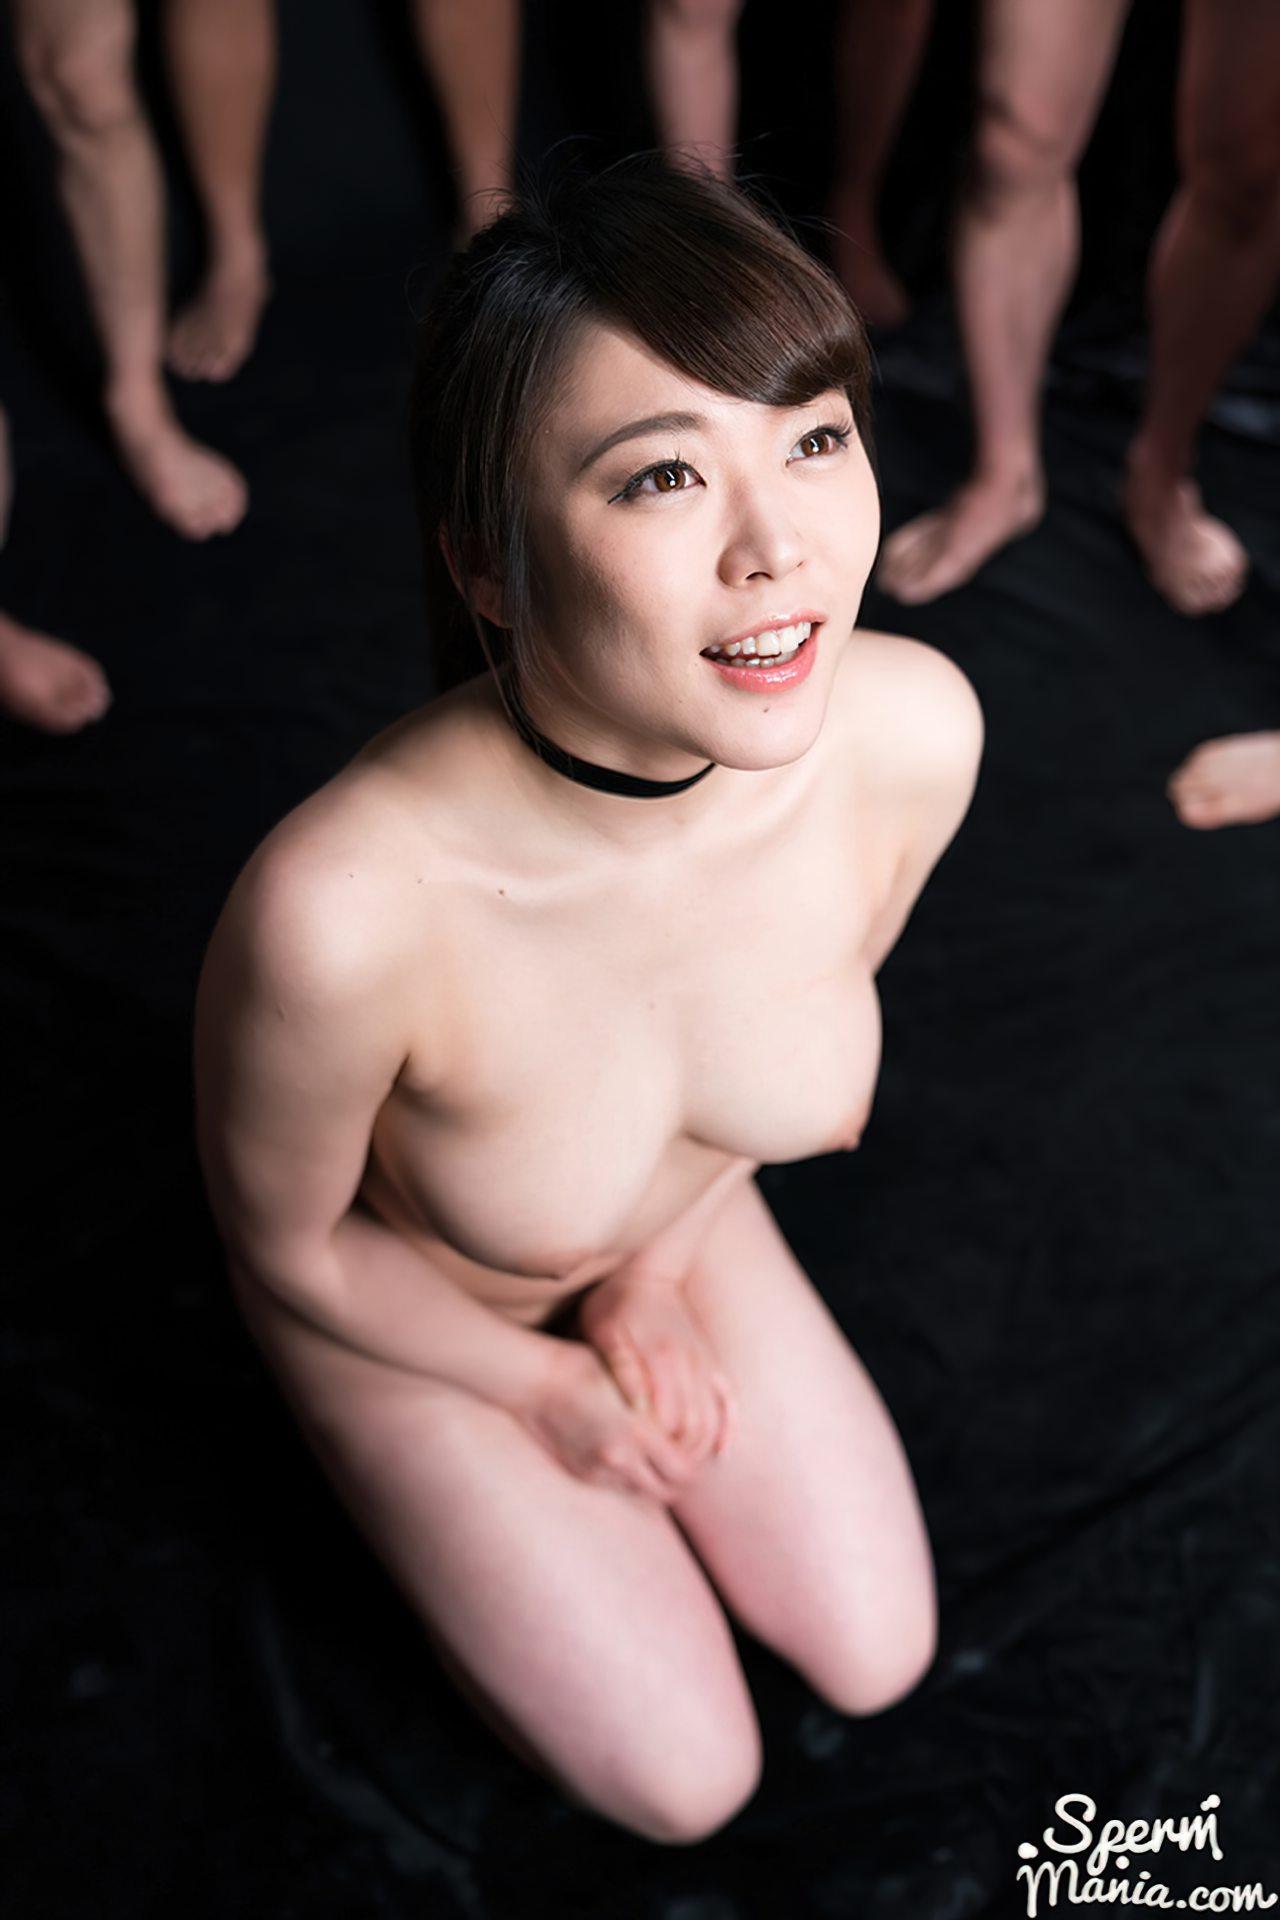 Mulher Japonesa Coberta de Porra (16)